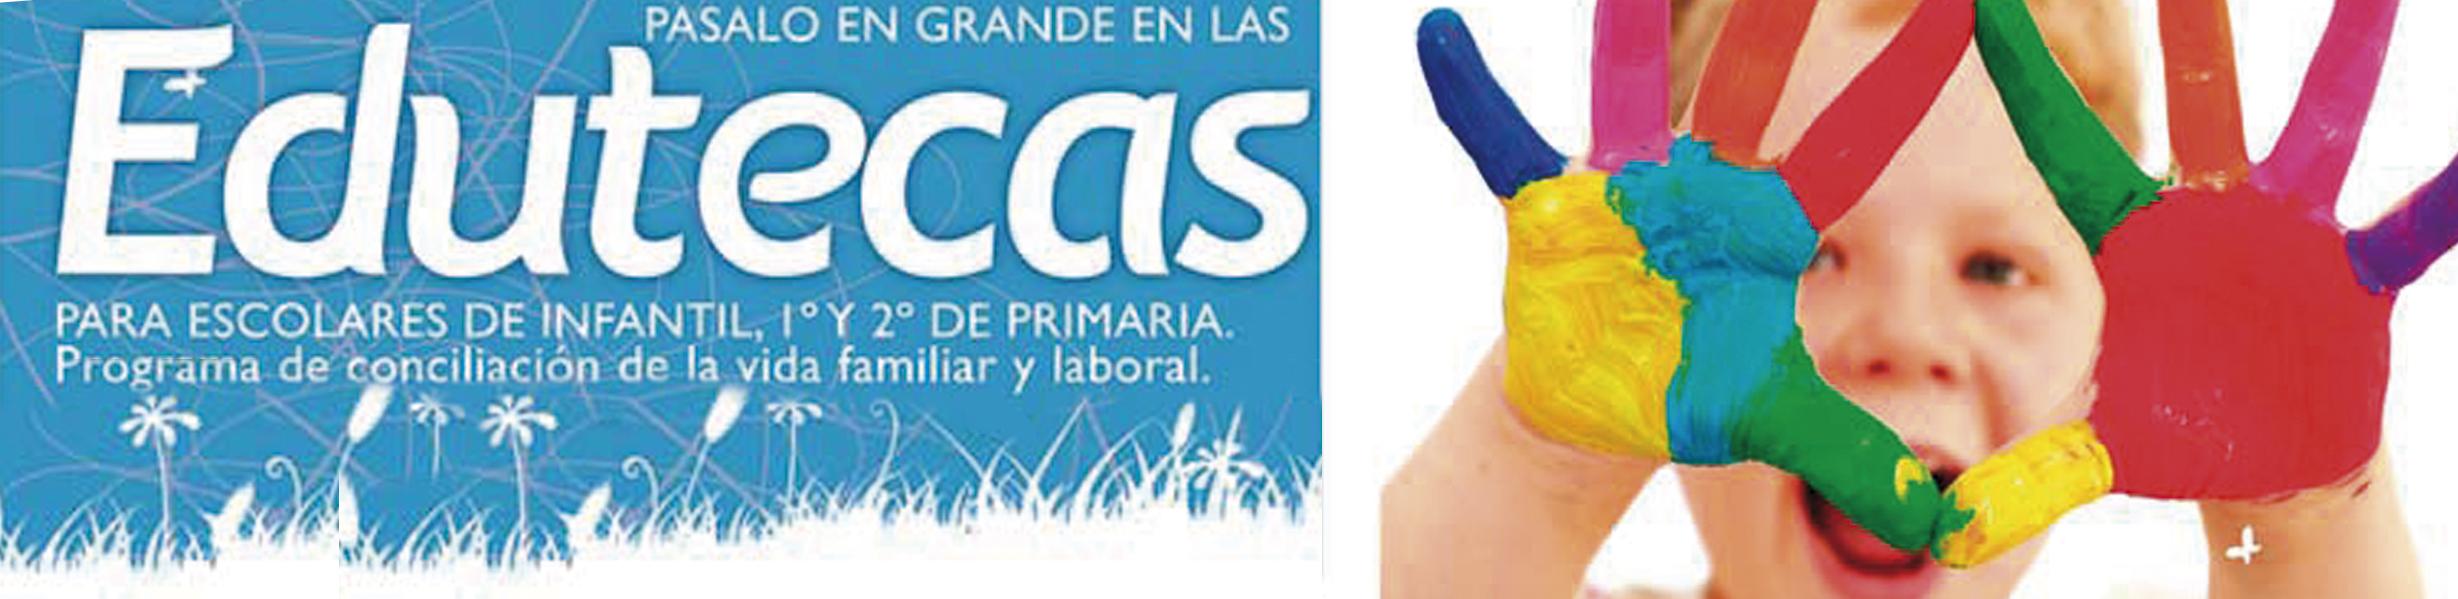 Banner eduteca